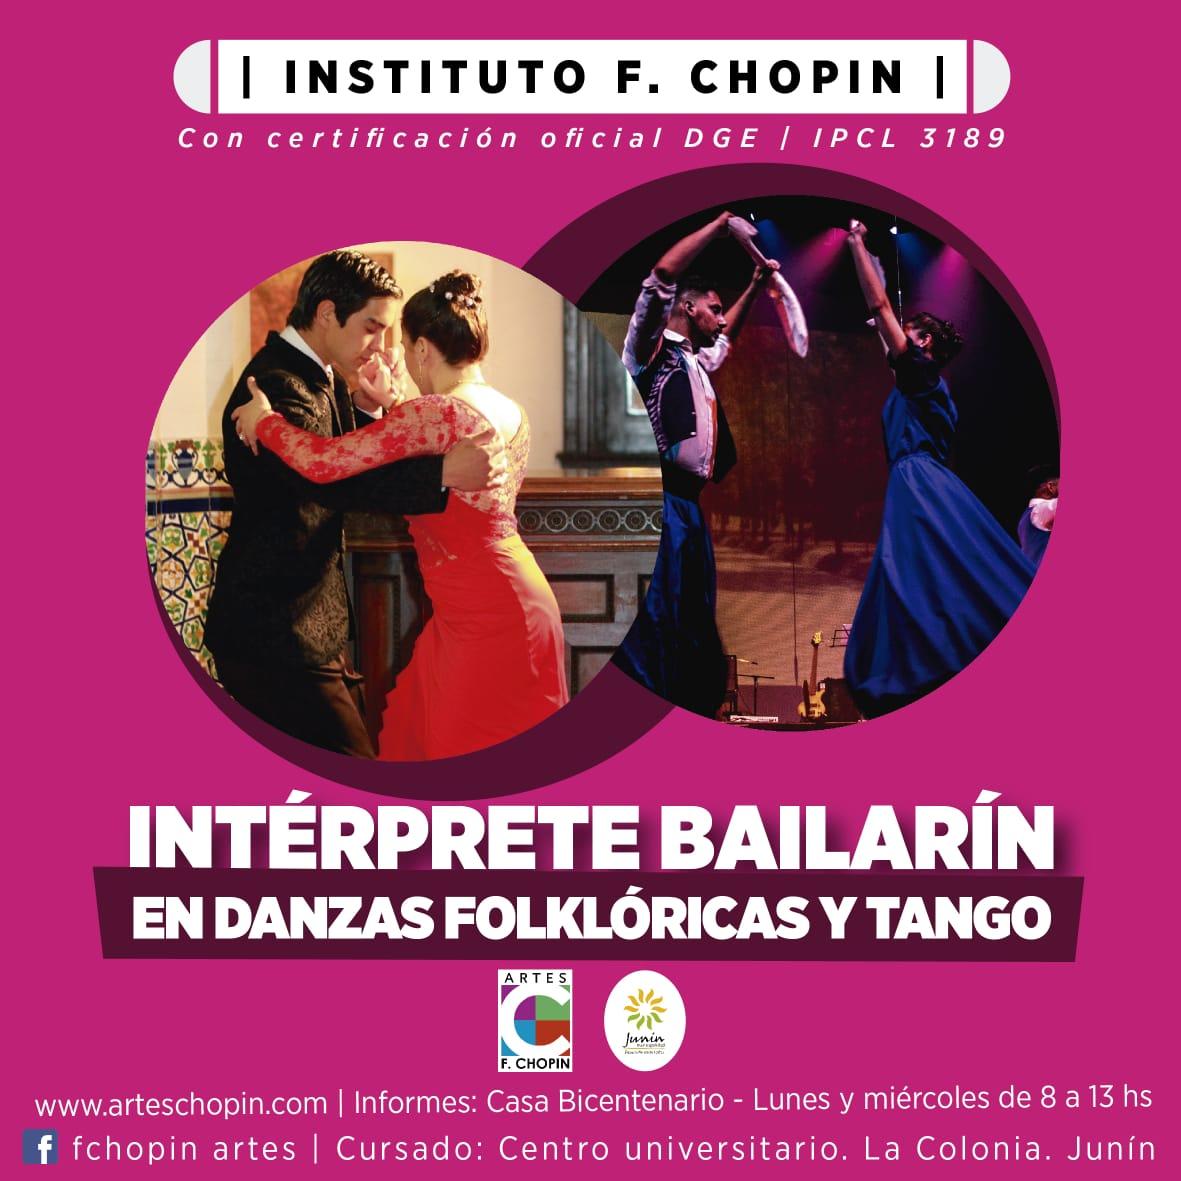 Interprete bailarin